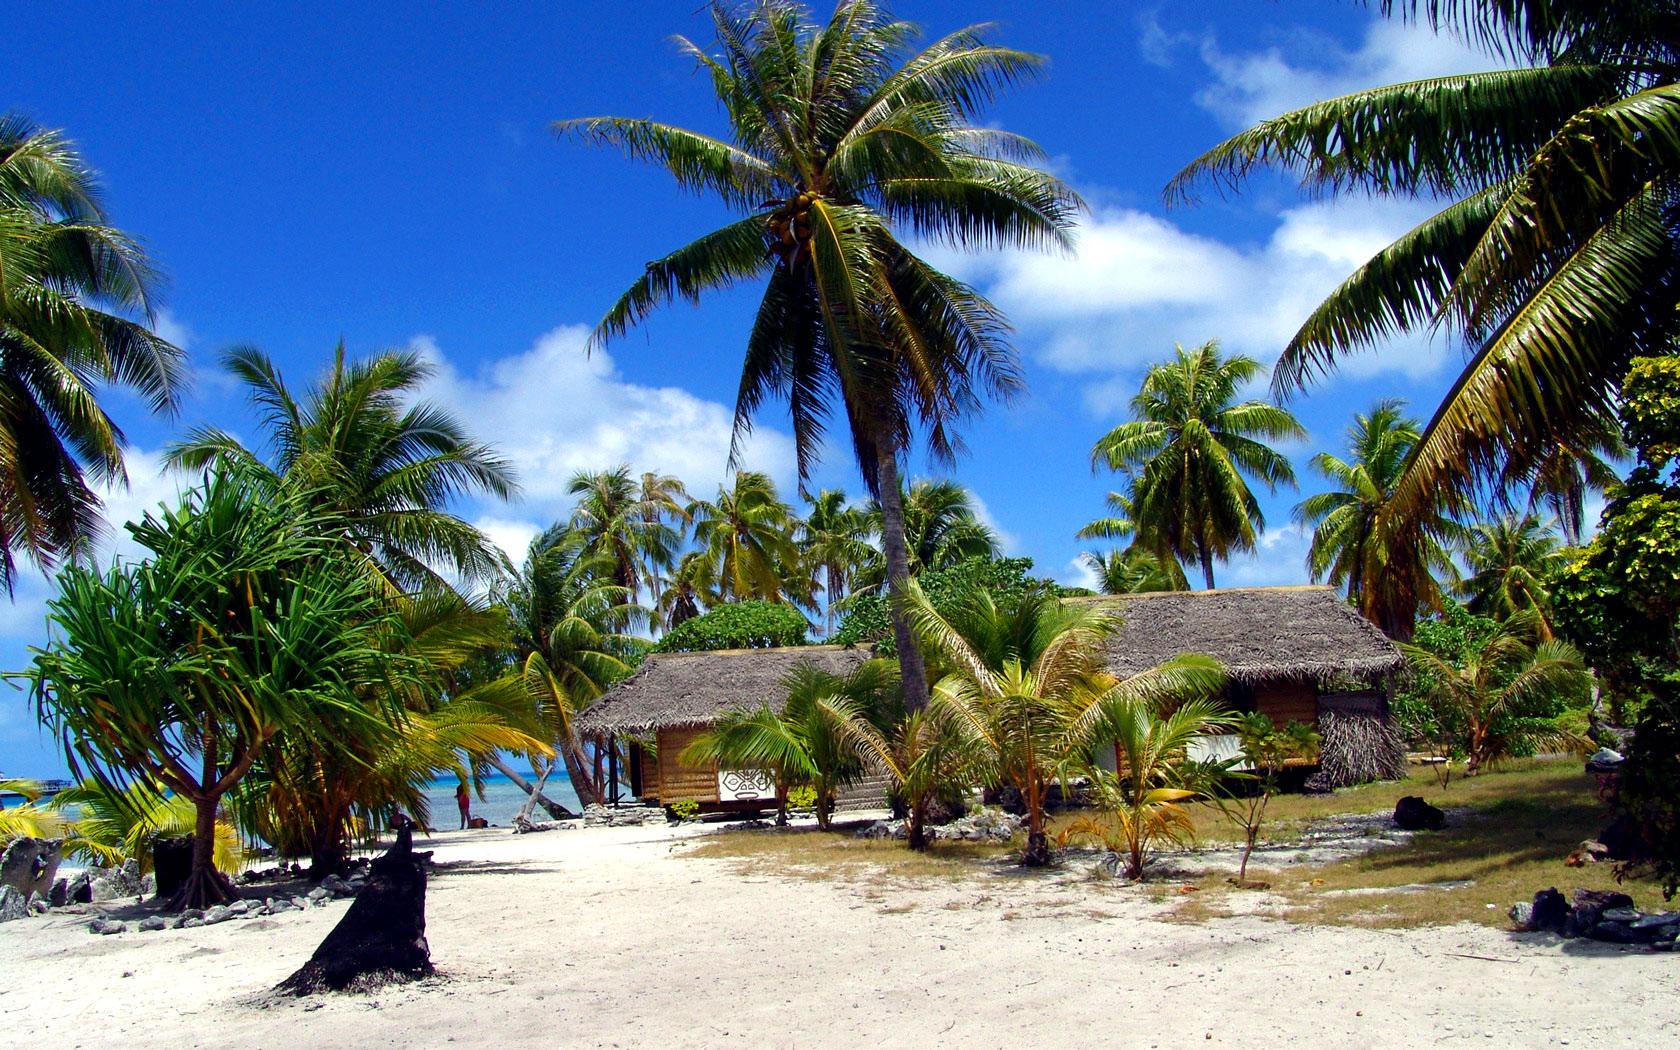 tropical sandy beach wallpaper - photo #27